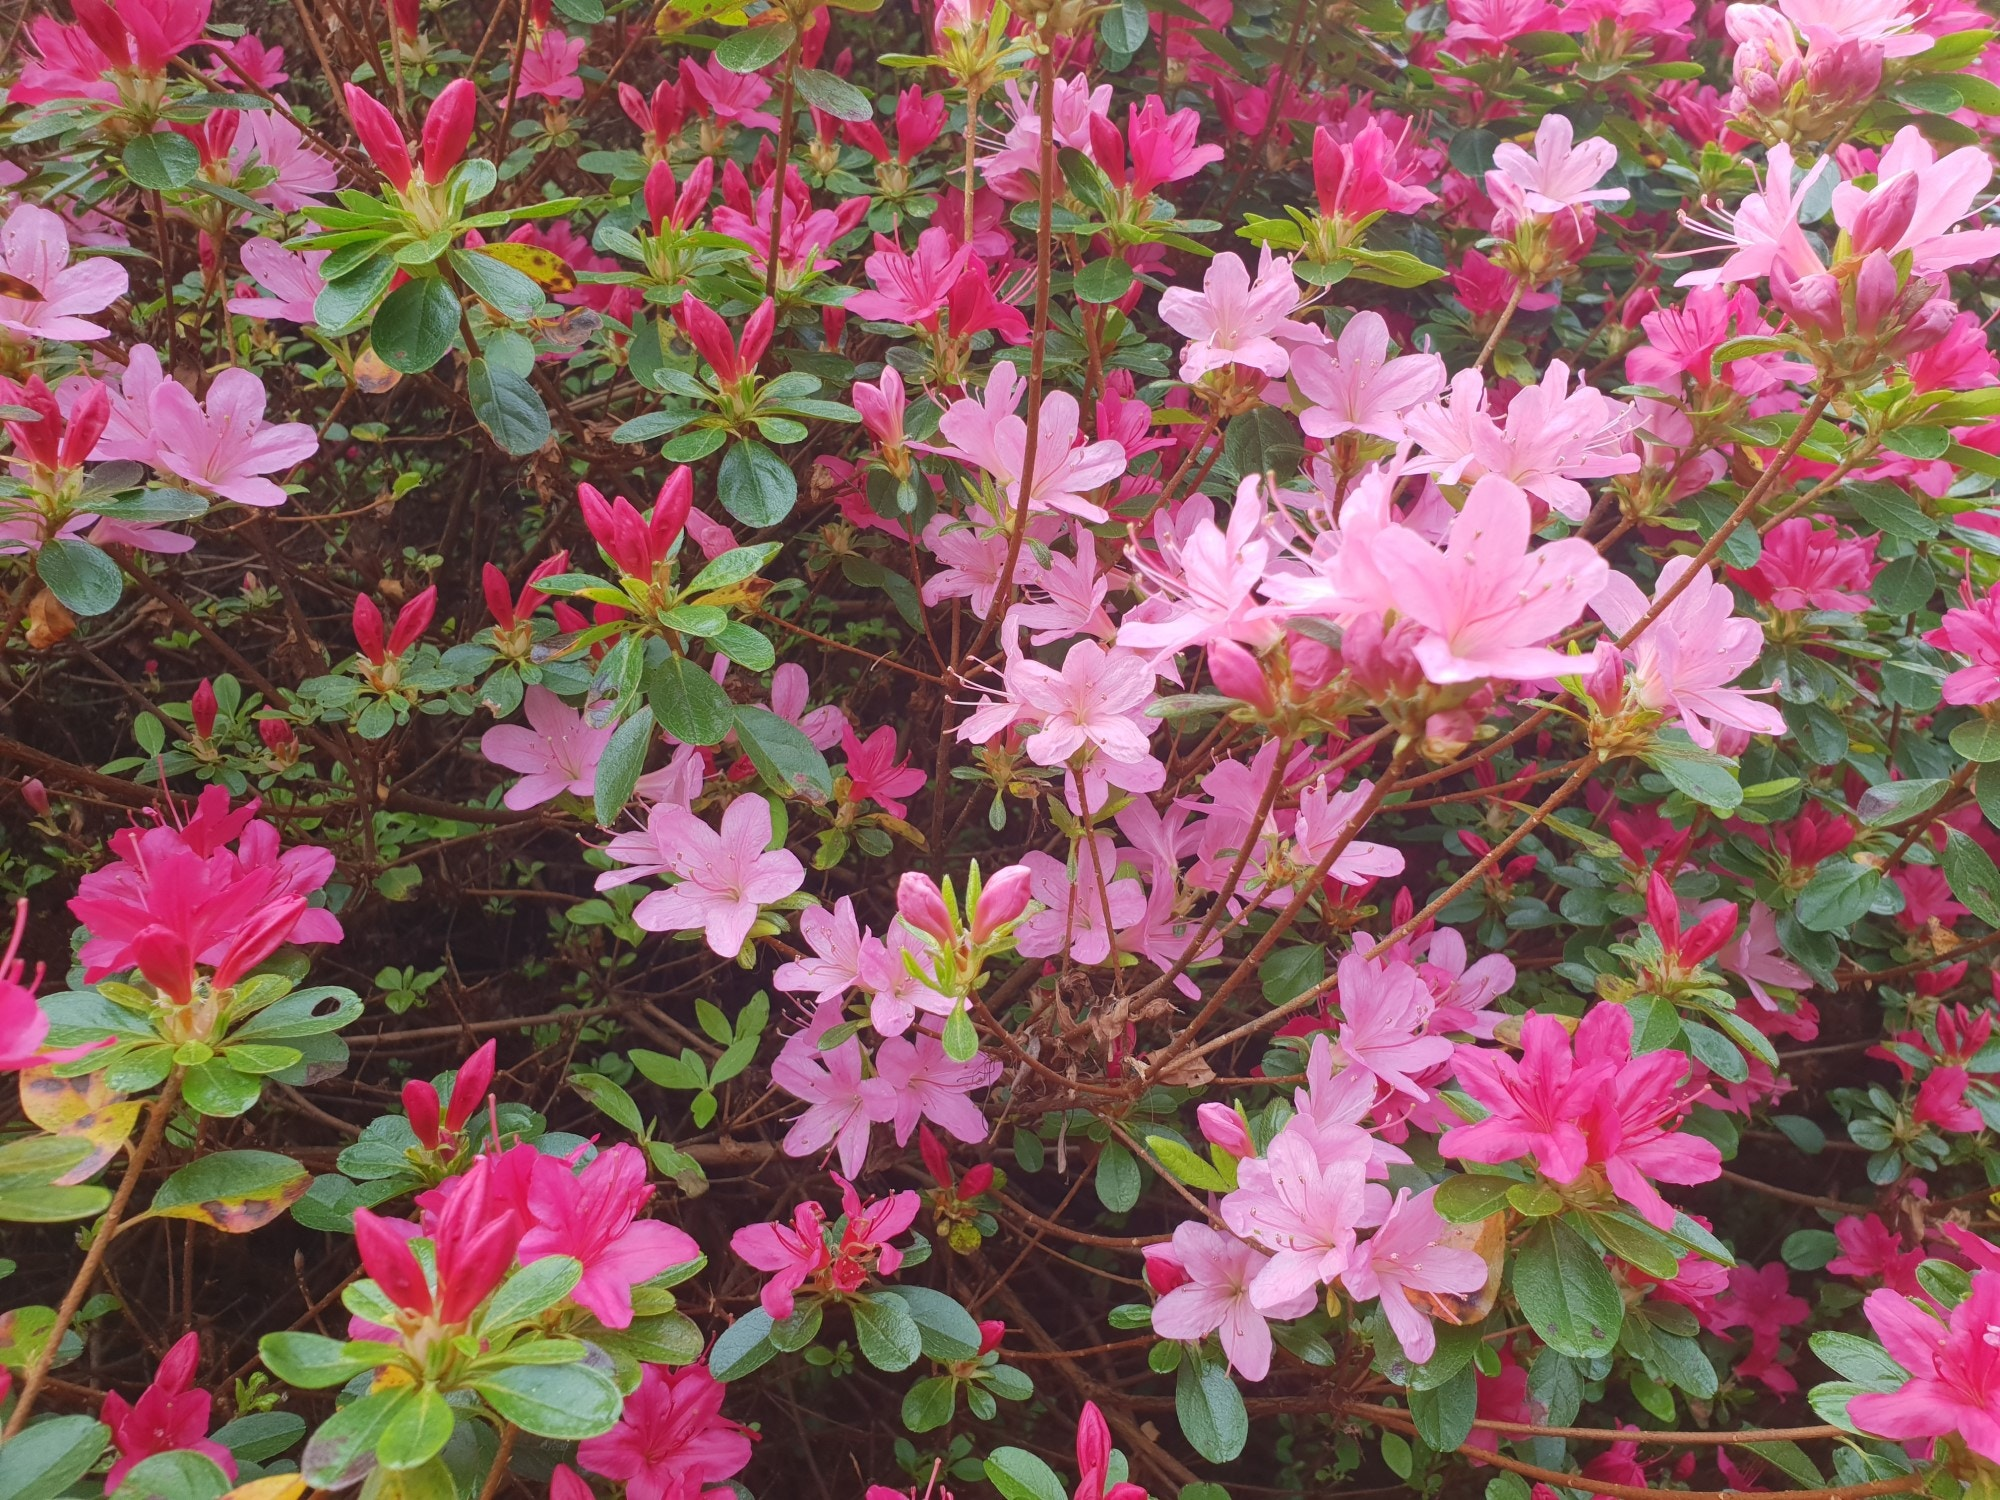 Dazzling spring display at Furzey Gardens